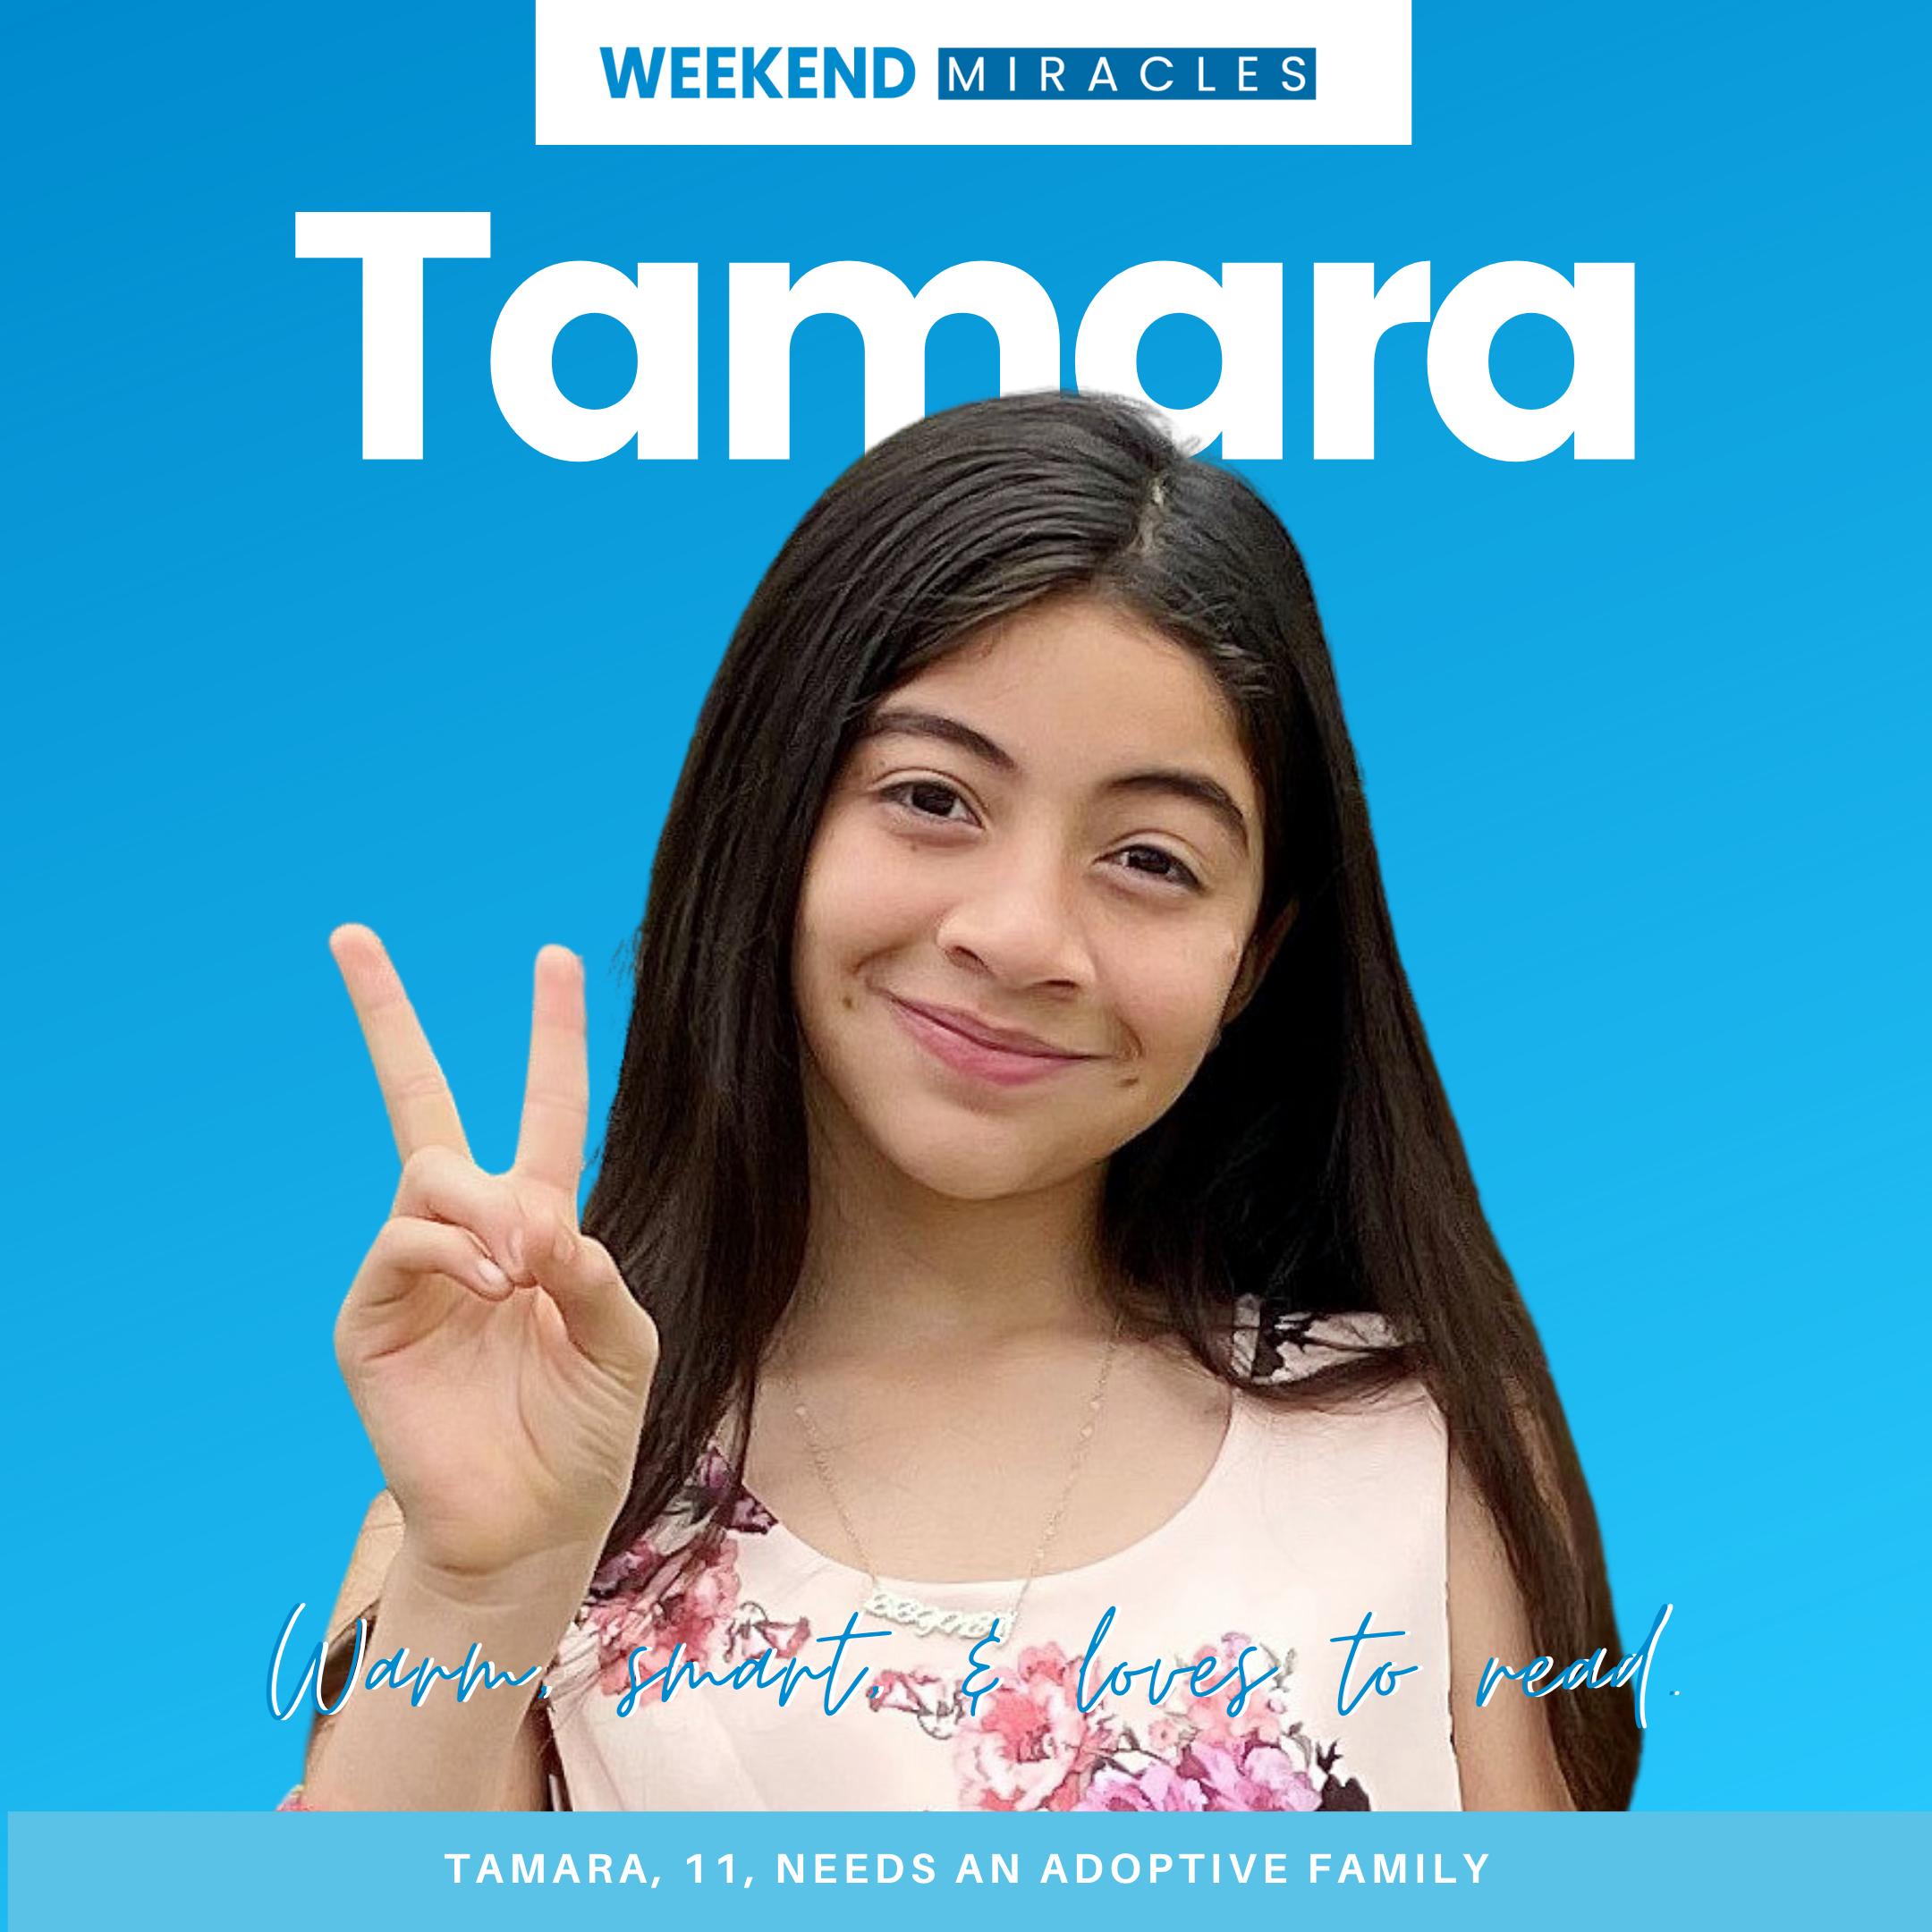 Meet Tamara